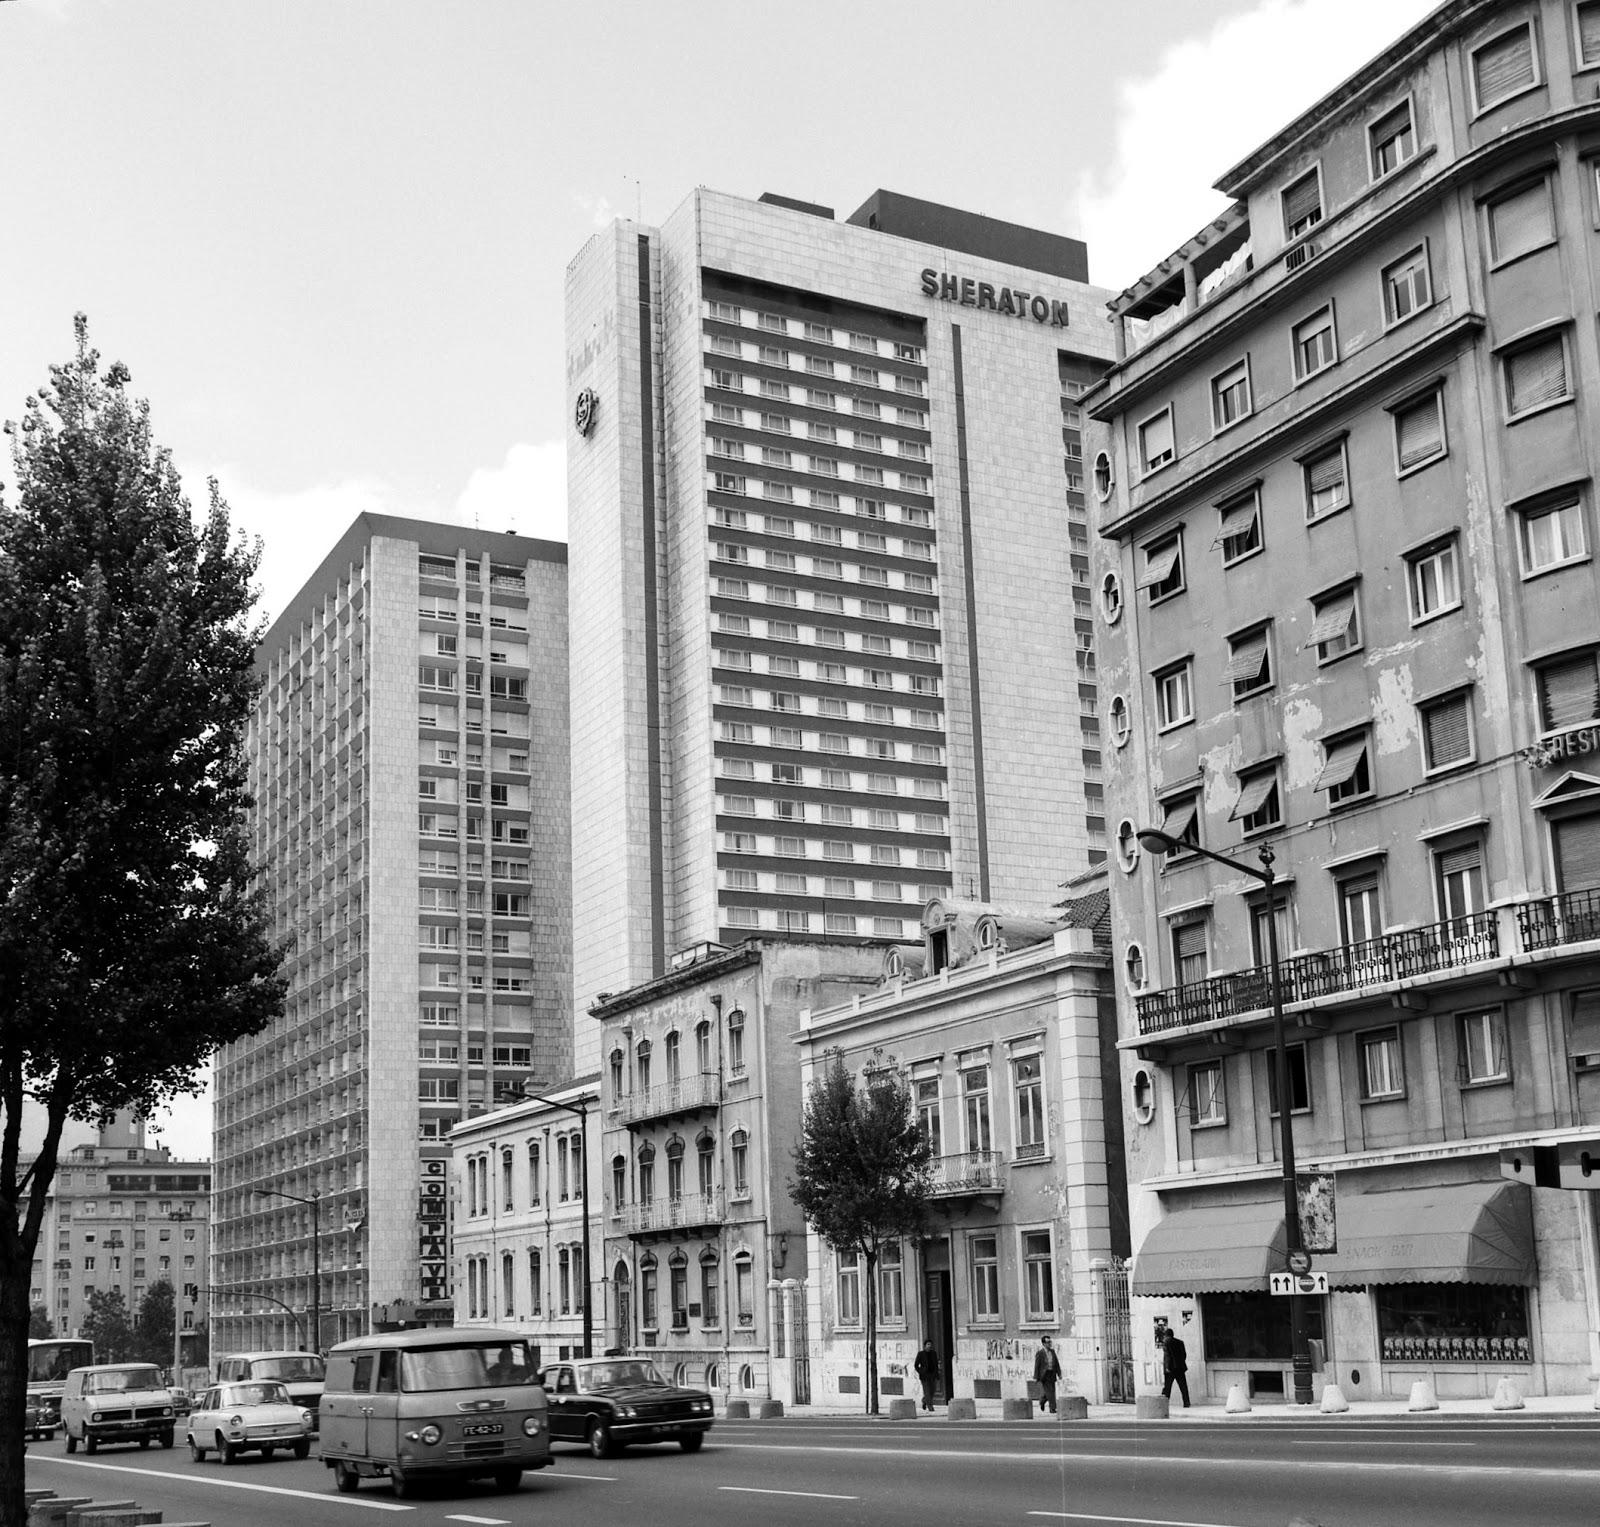 [Edificio-Aviz-e-Hotel-Sheraton5]